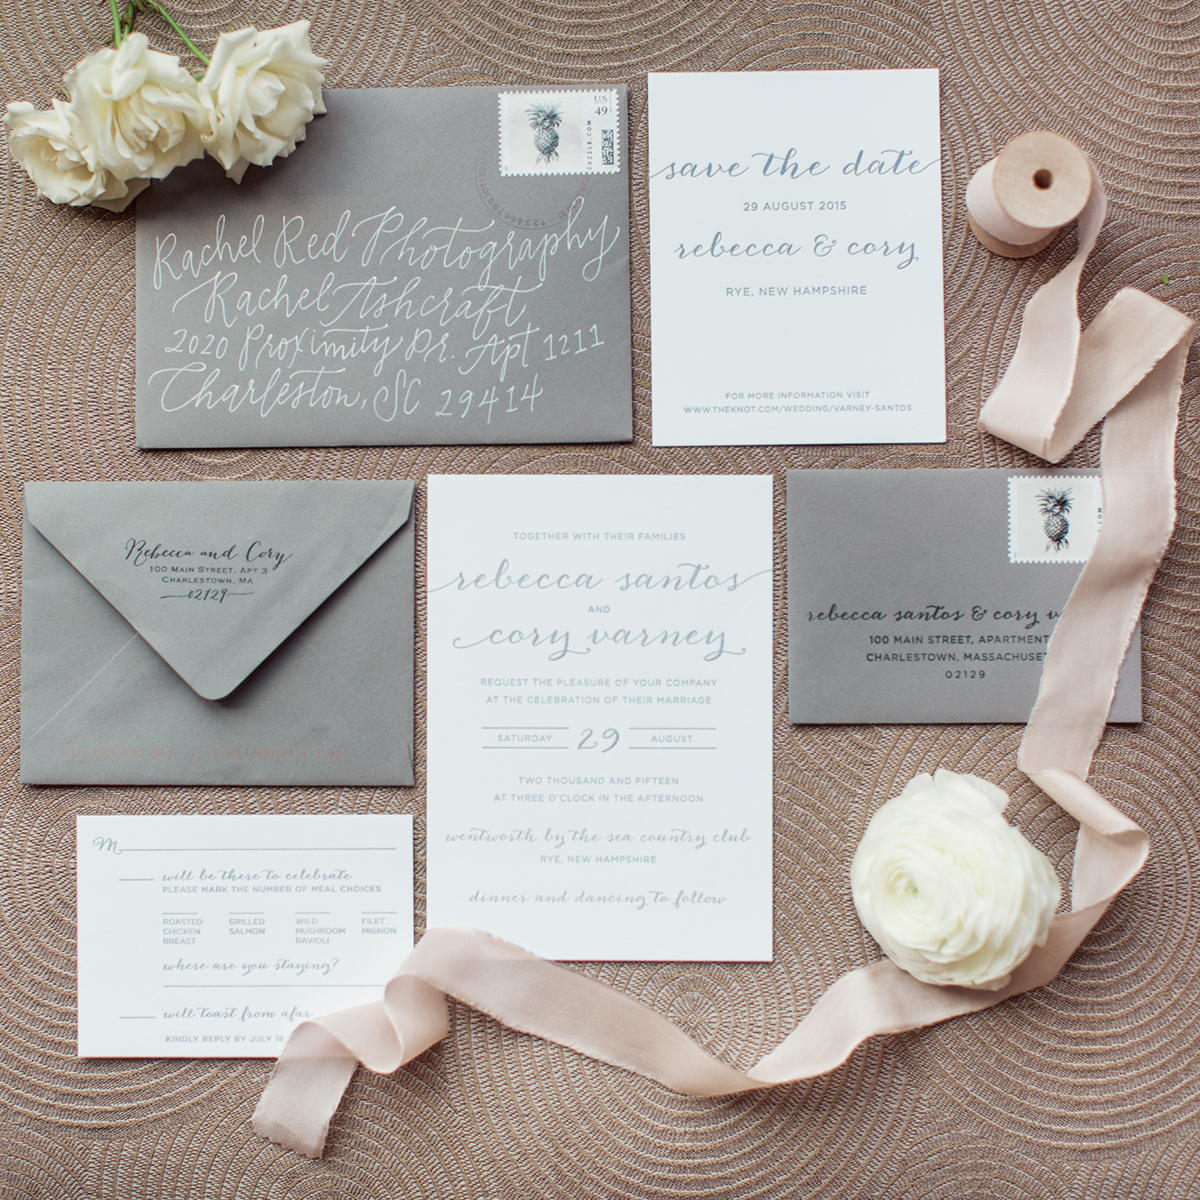 Becca-Cory-New-Hampshire-Wedding-RachelRedPhotography-109.jpg